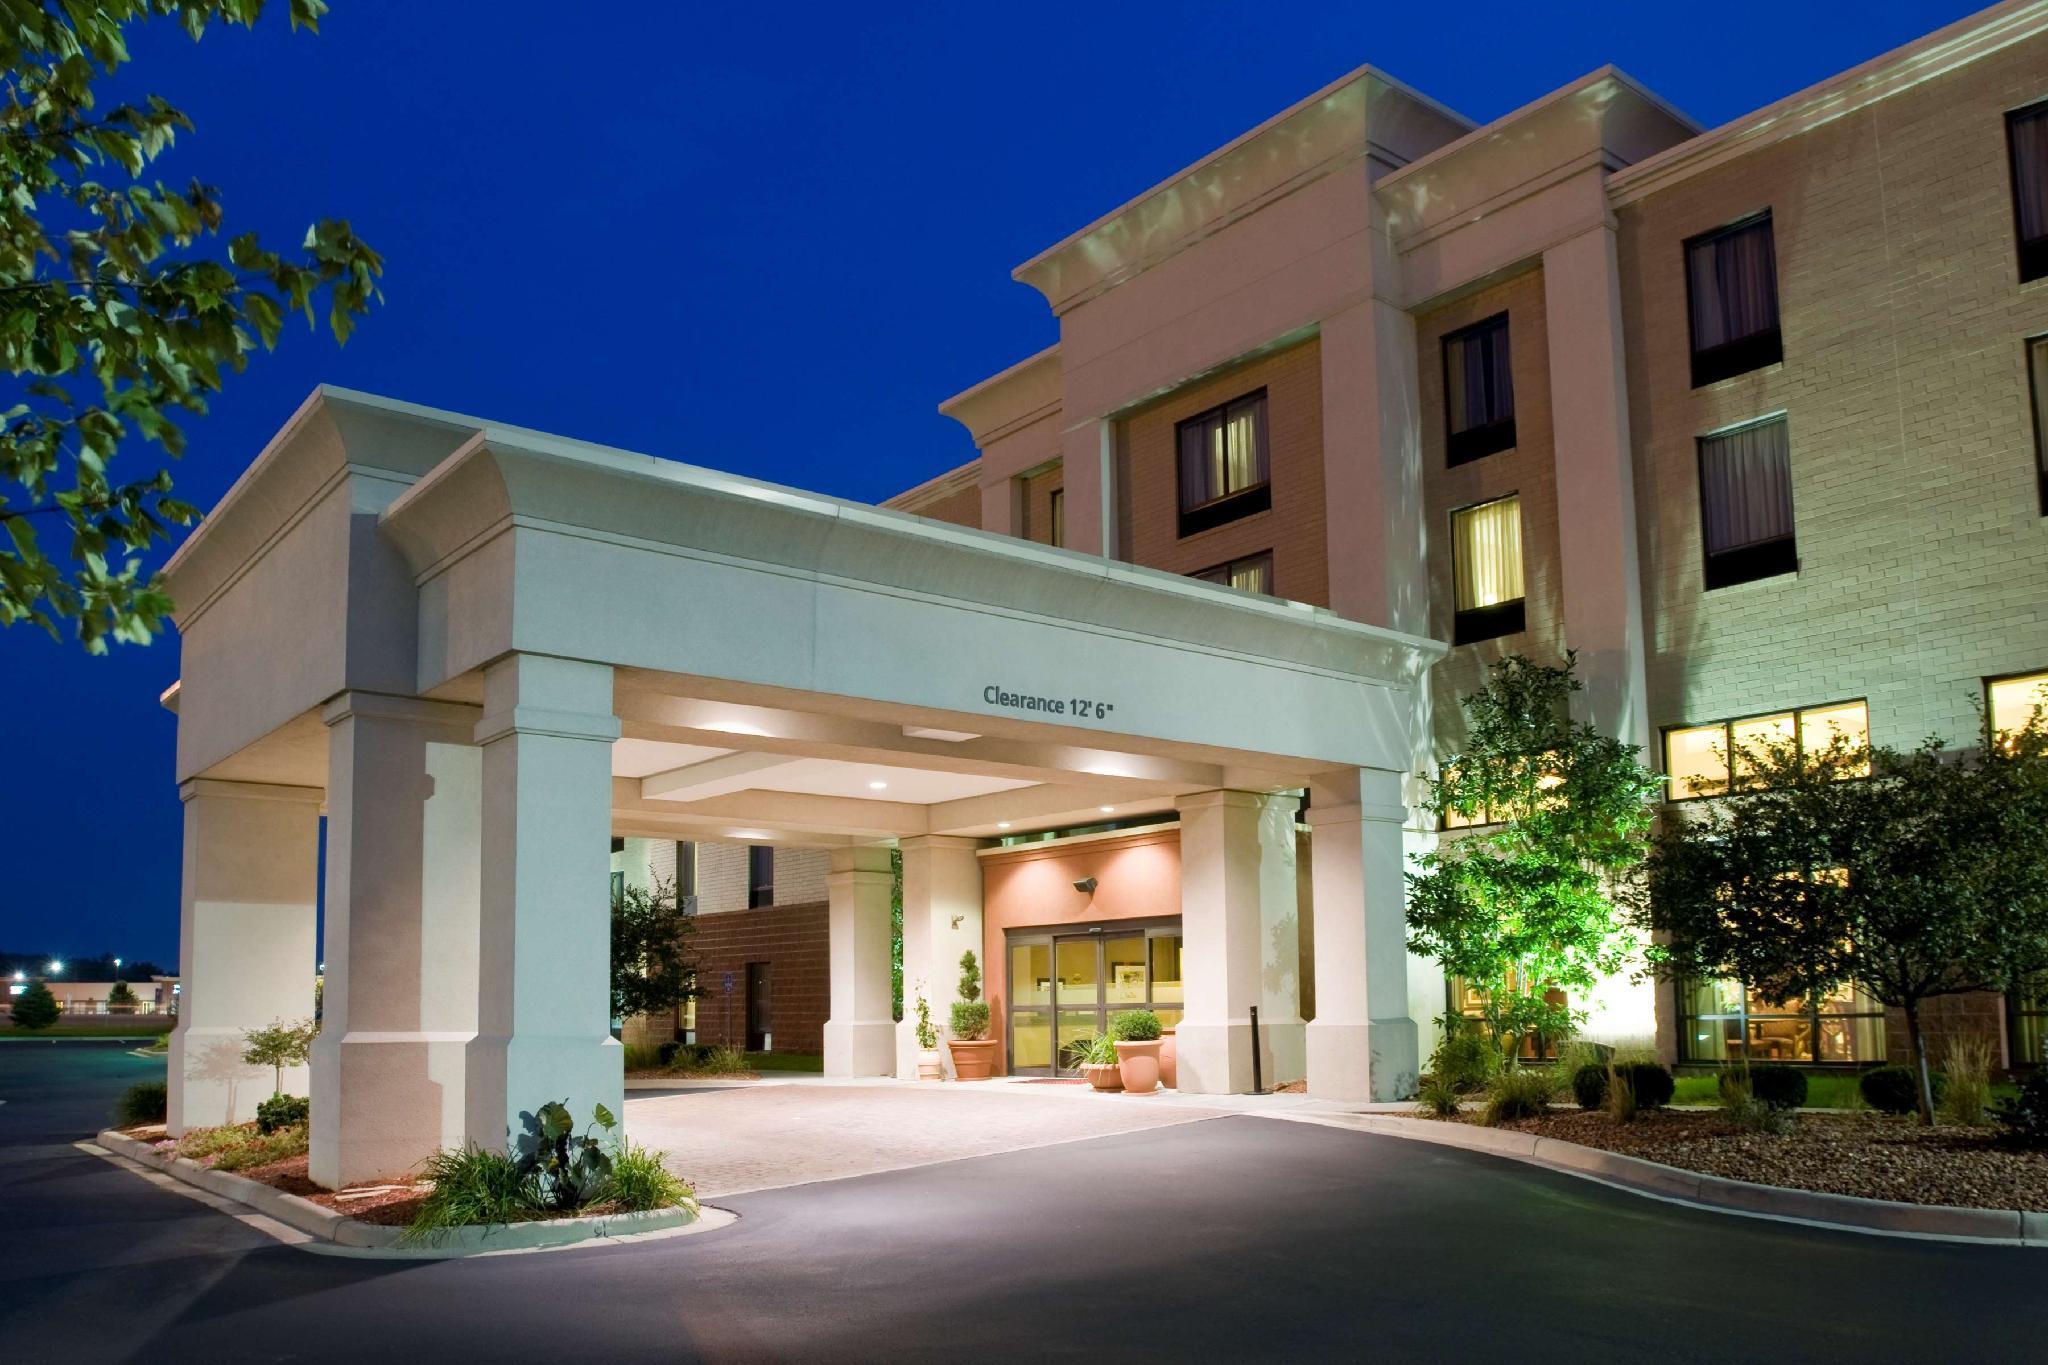 Hampton Inn And Suites Cincinnati Union Ctr